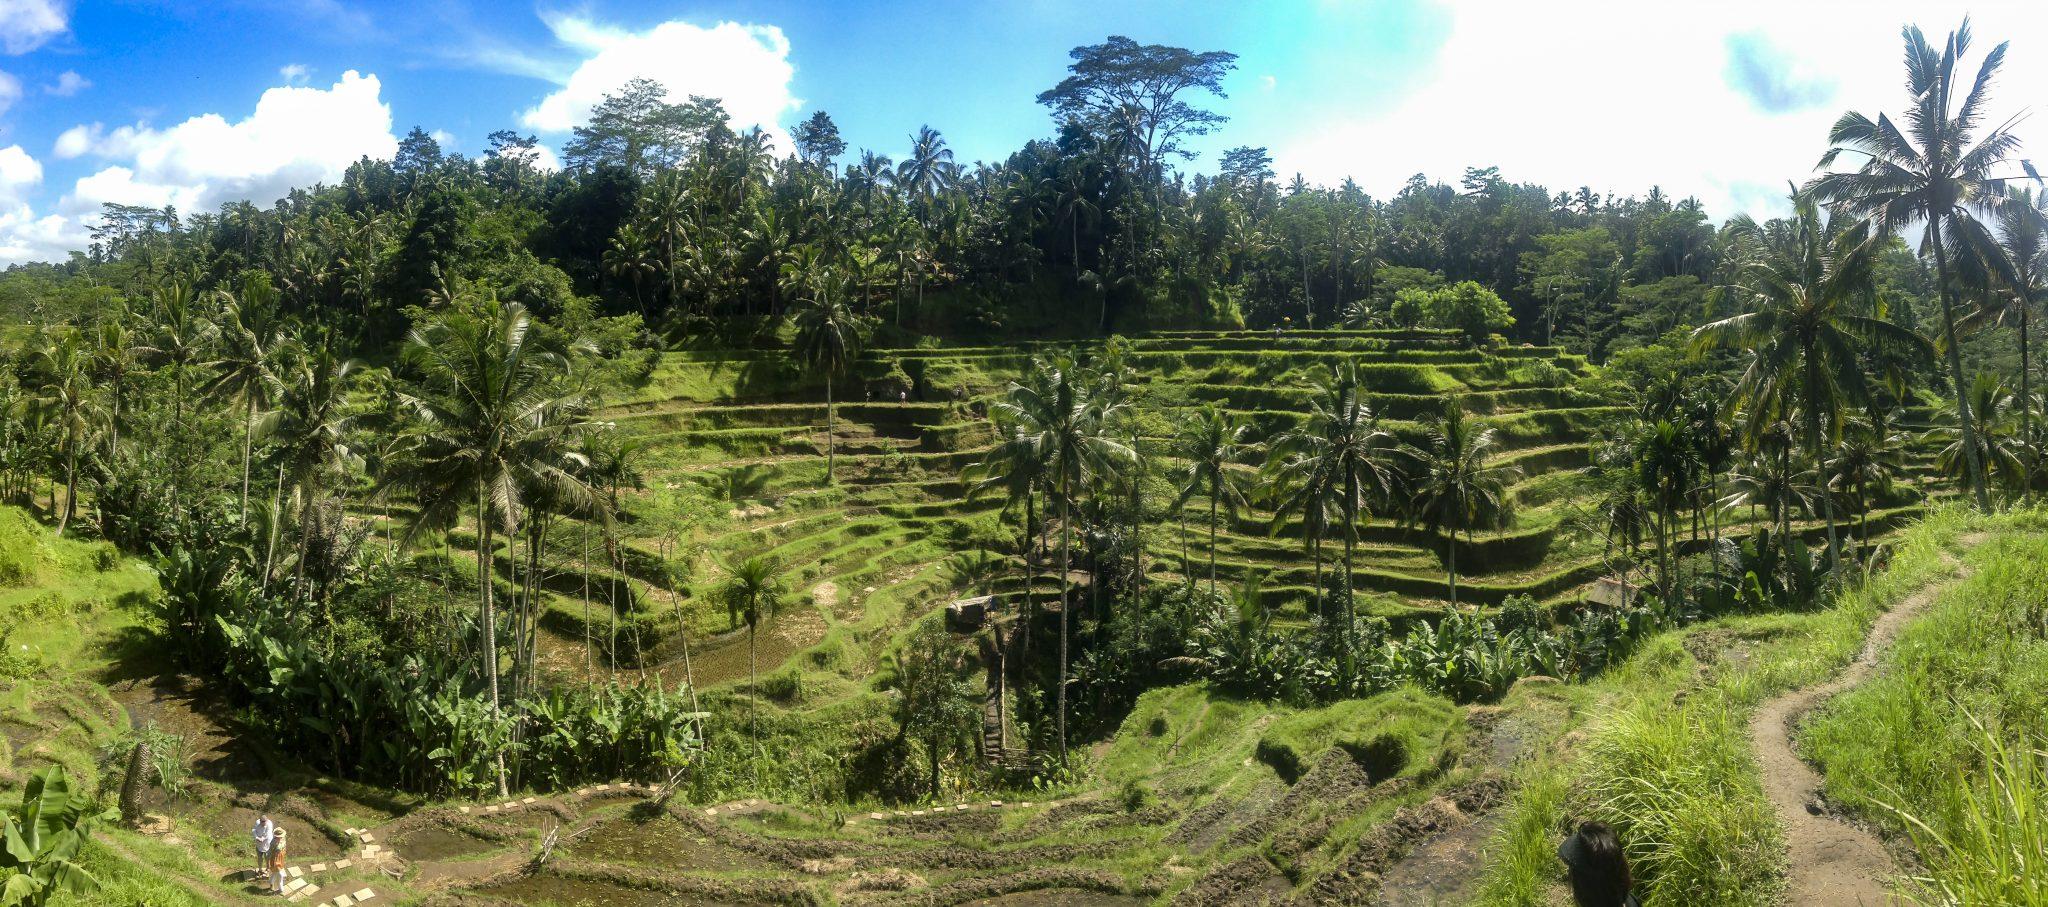 Tarasy ryżowe Tegallalang - Ubud, Bali